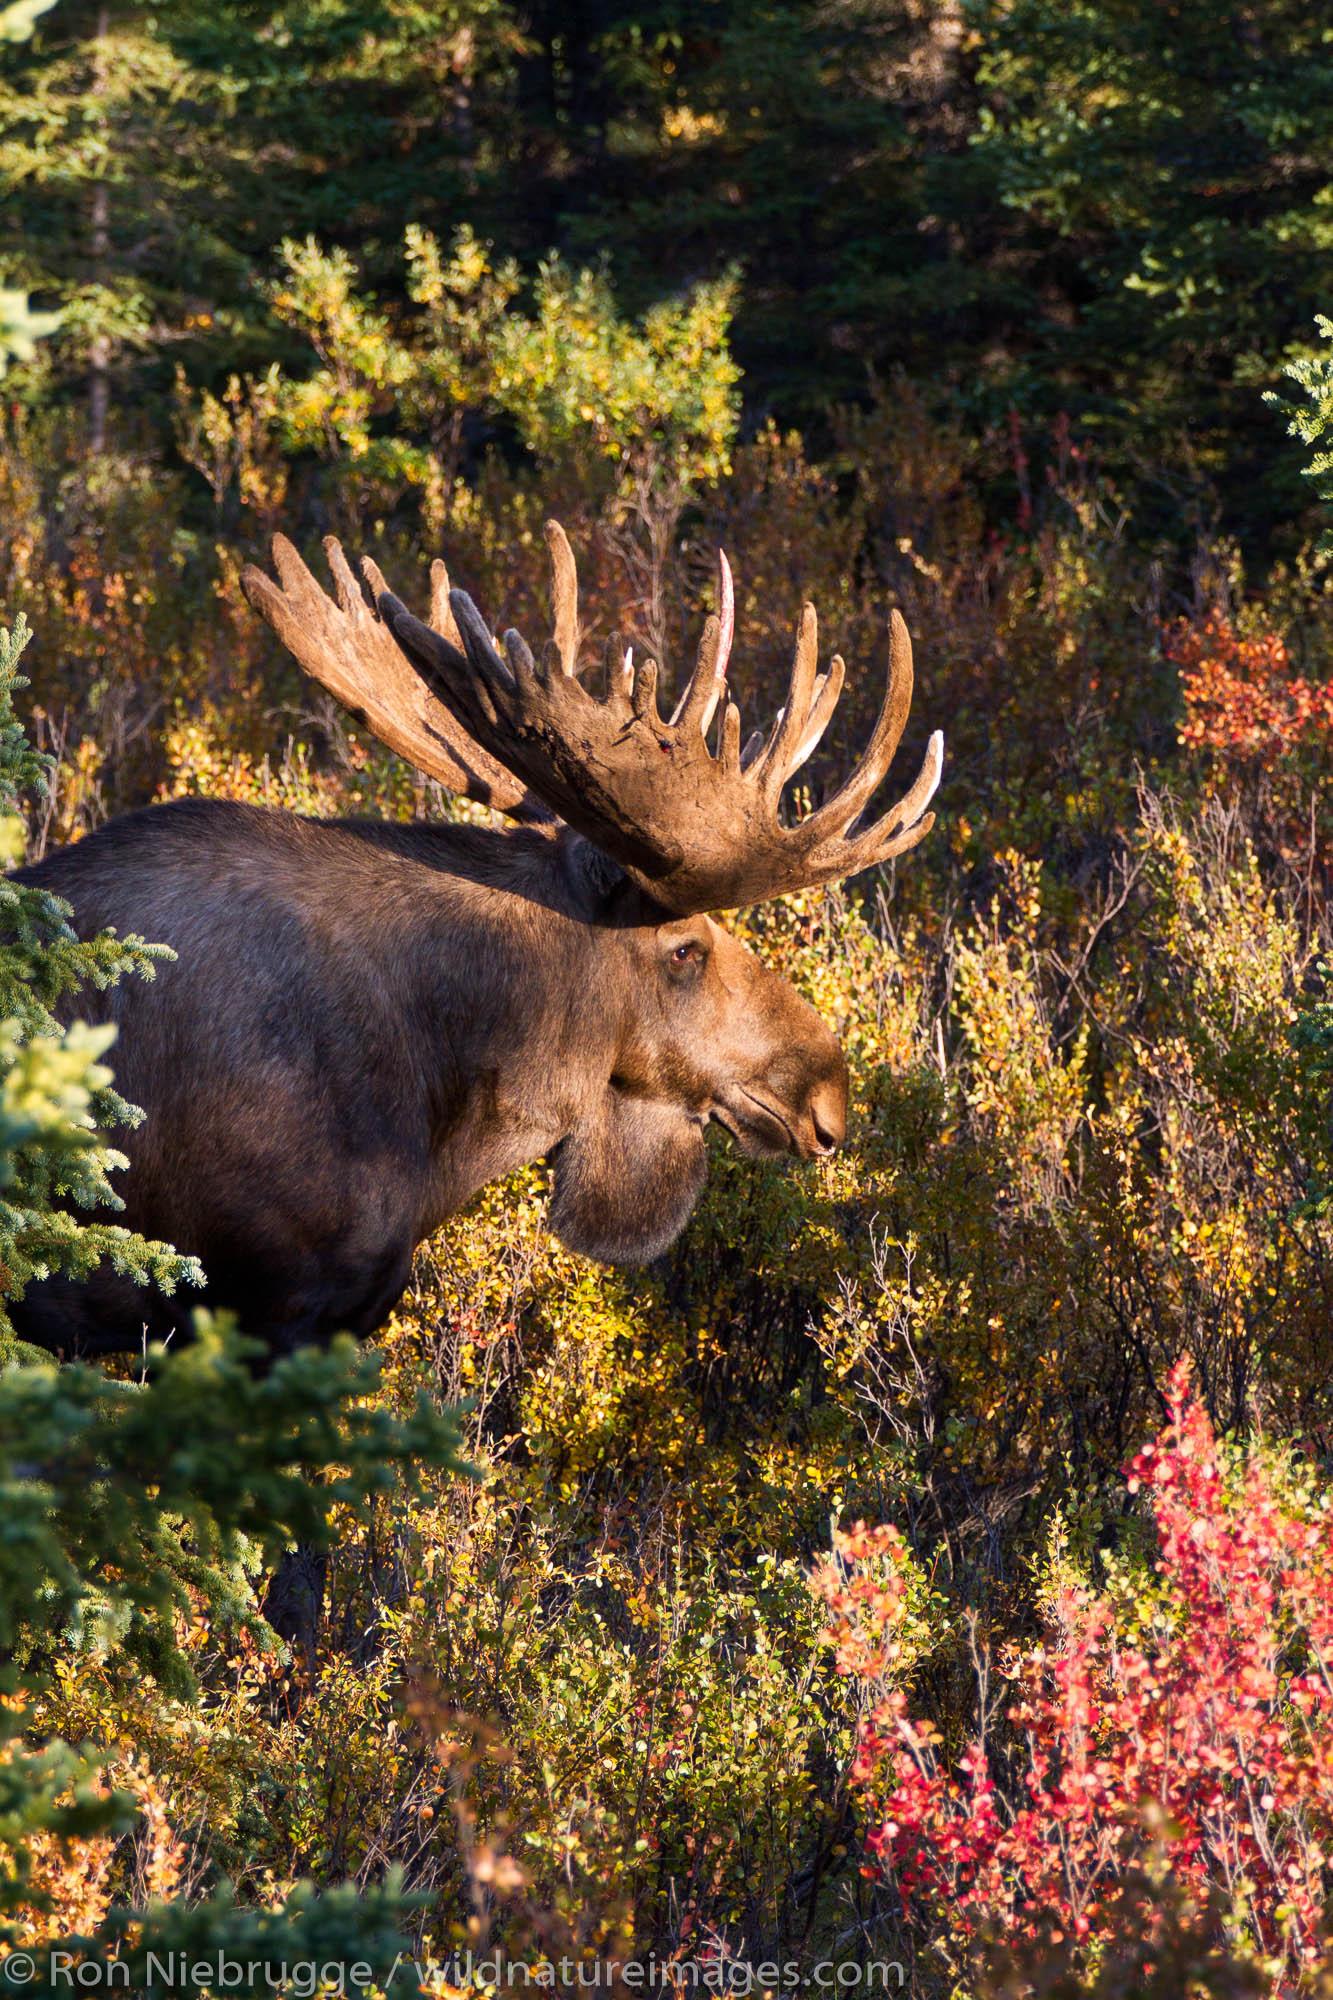 Bull moose, Denali National Park, Alaska.